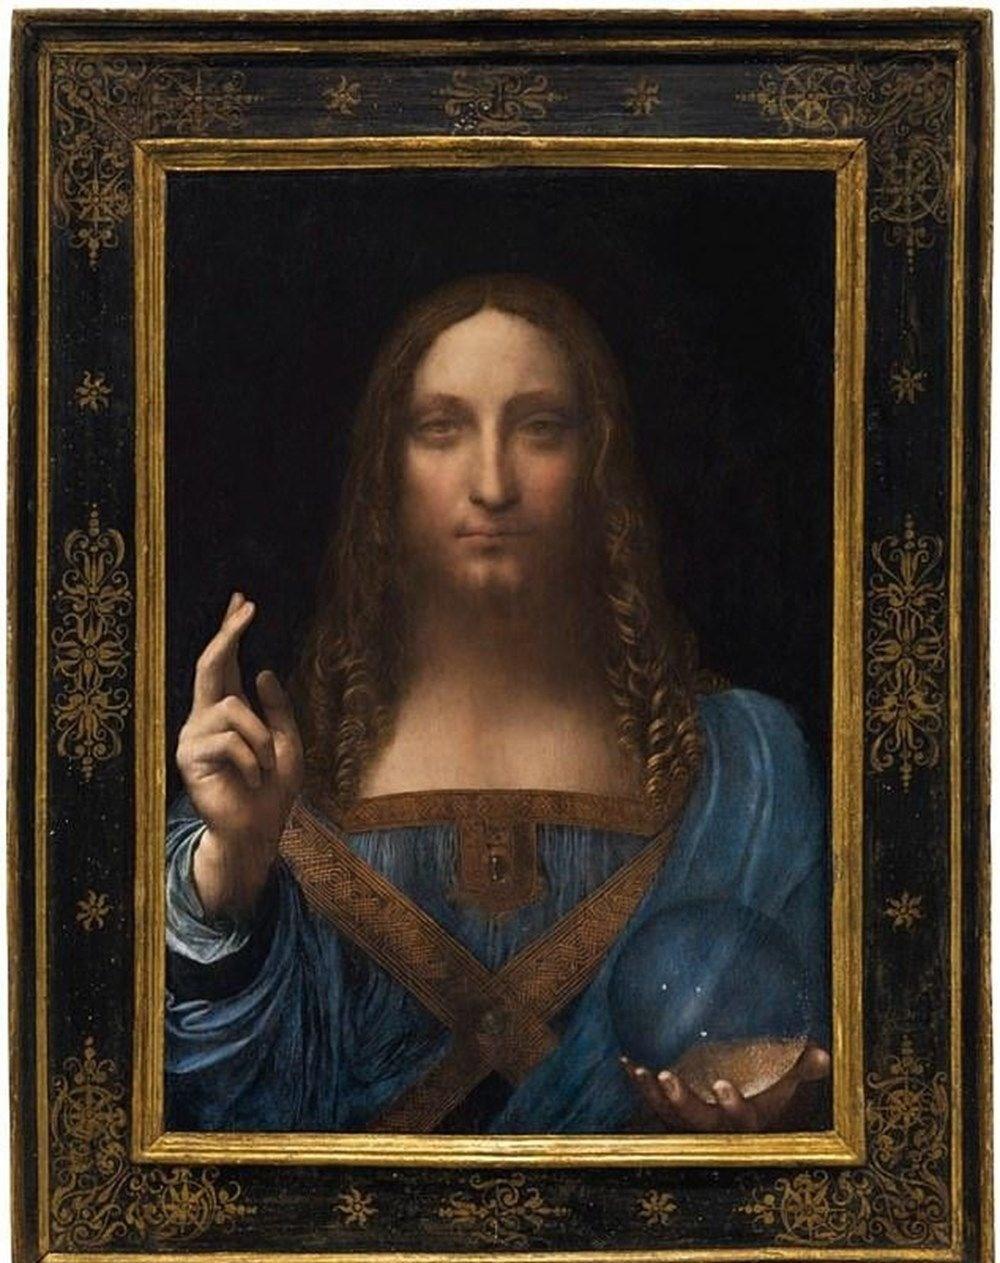 Leonardo da Vinci'nin Salvator Mundi'si NFT oldu. 450 milyon dolara satışta